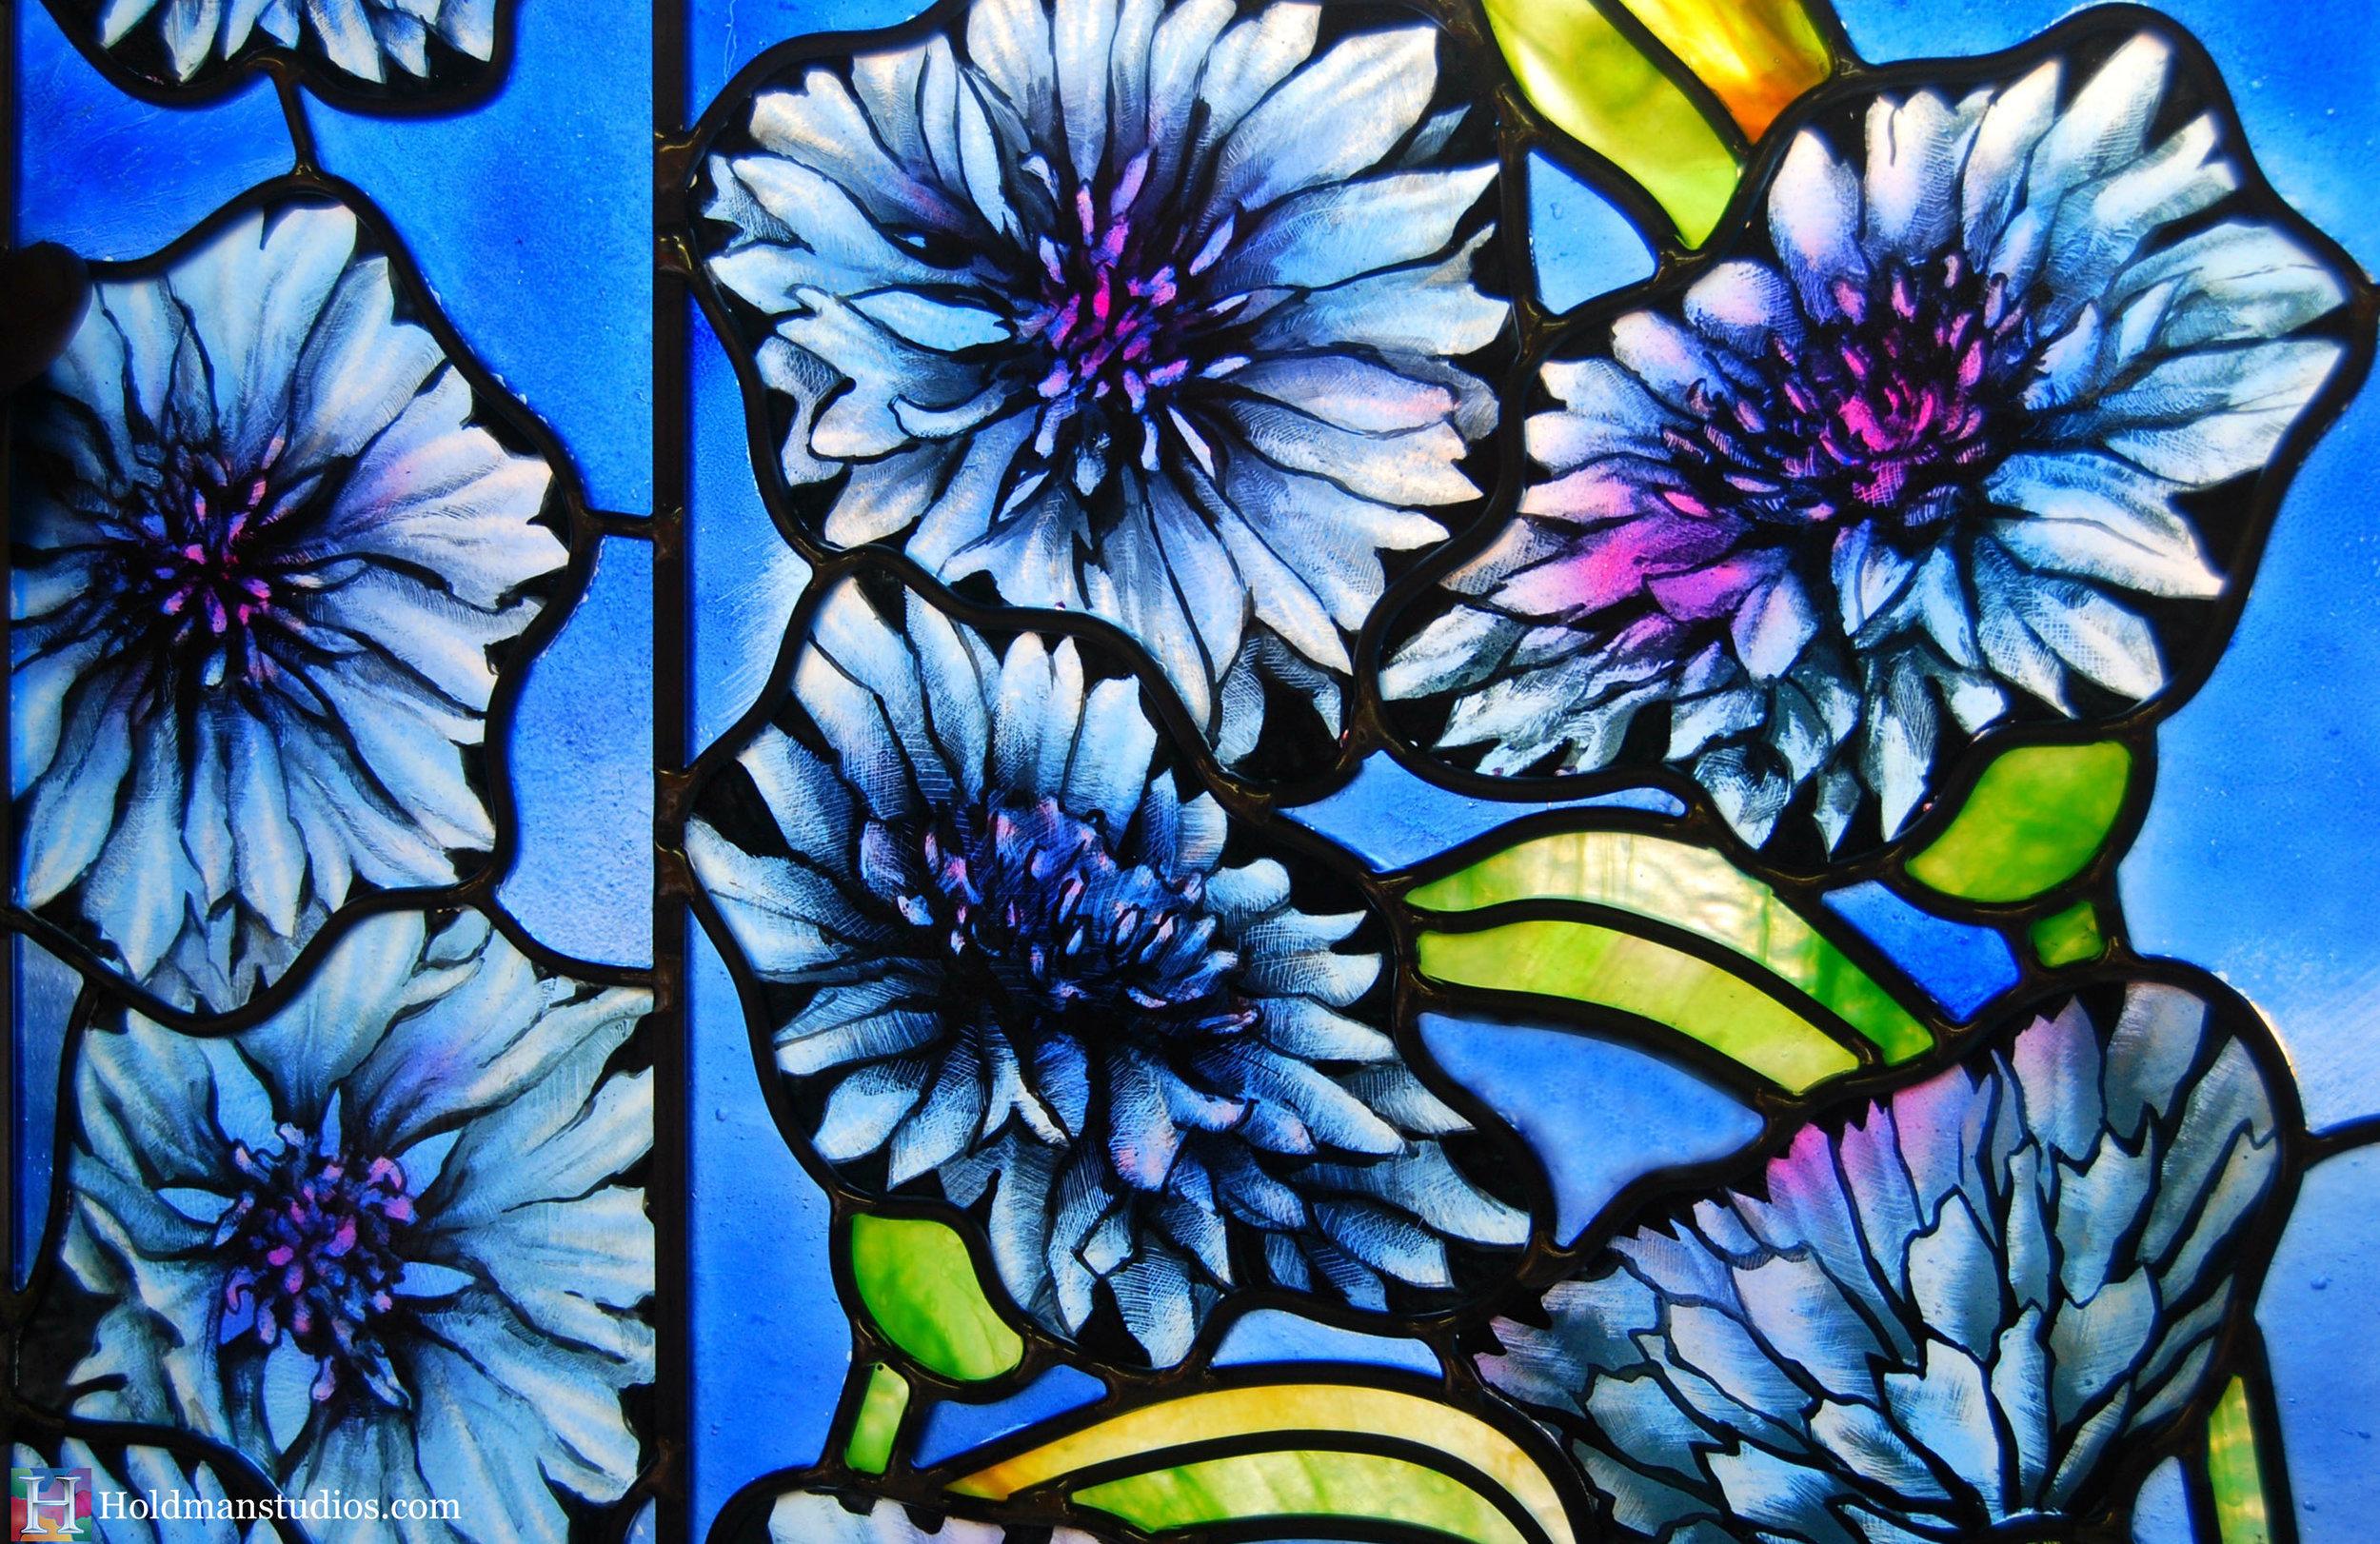 Holdman-Studios-Stained-Glass-Paris-LDS-Temple-Cornflower-Blue-Lily-Flowers-Leaves-Closeup-Windows.jpg